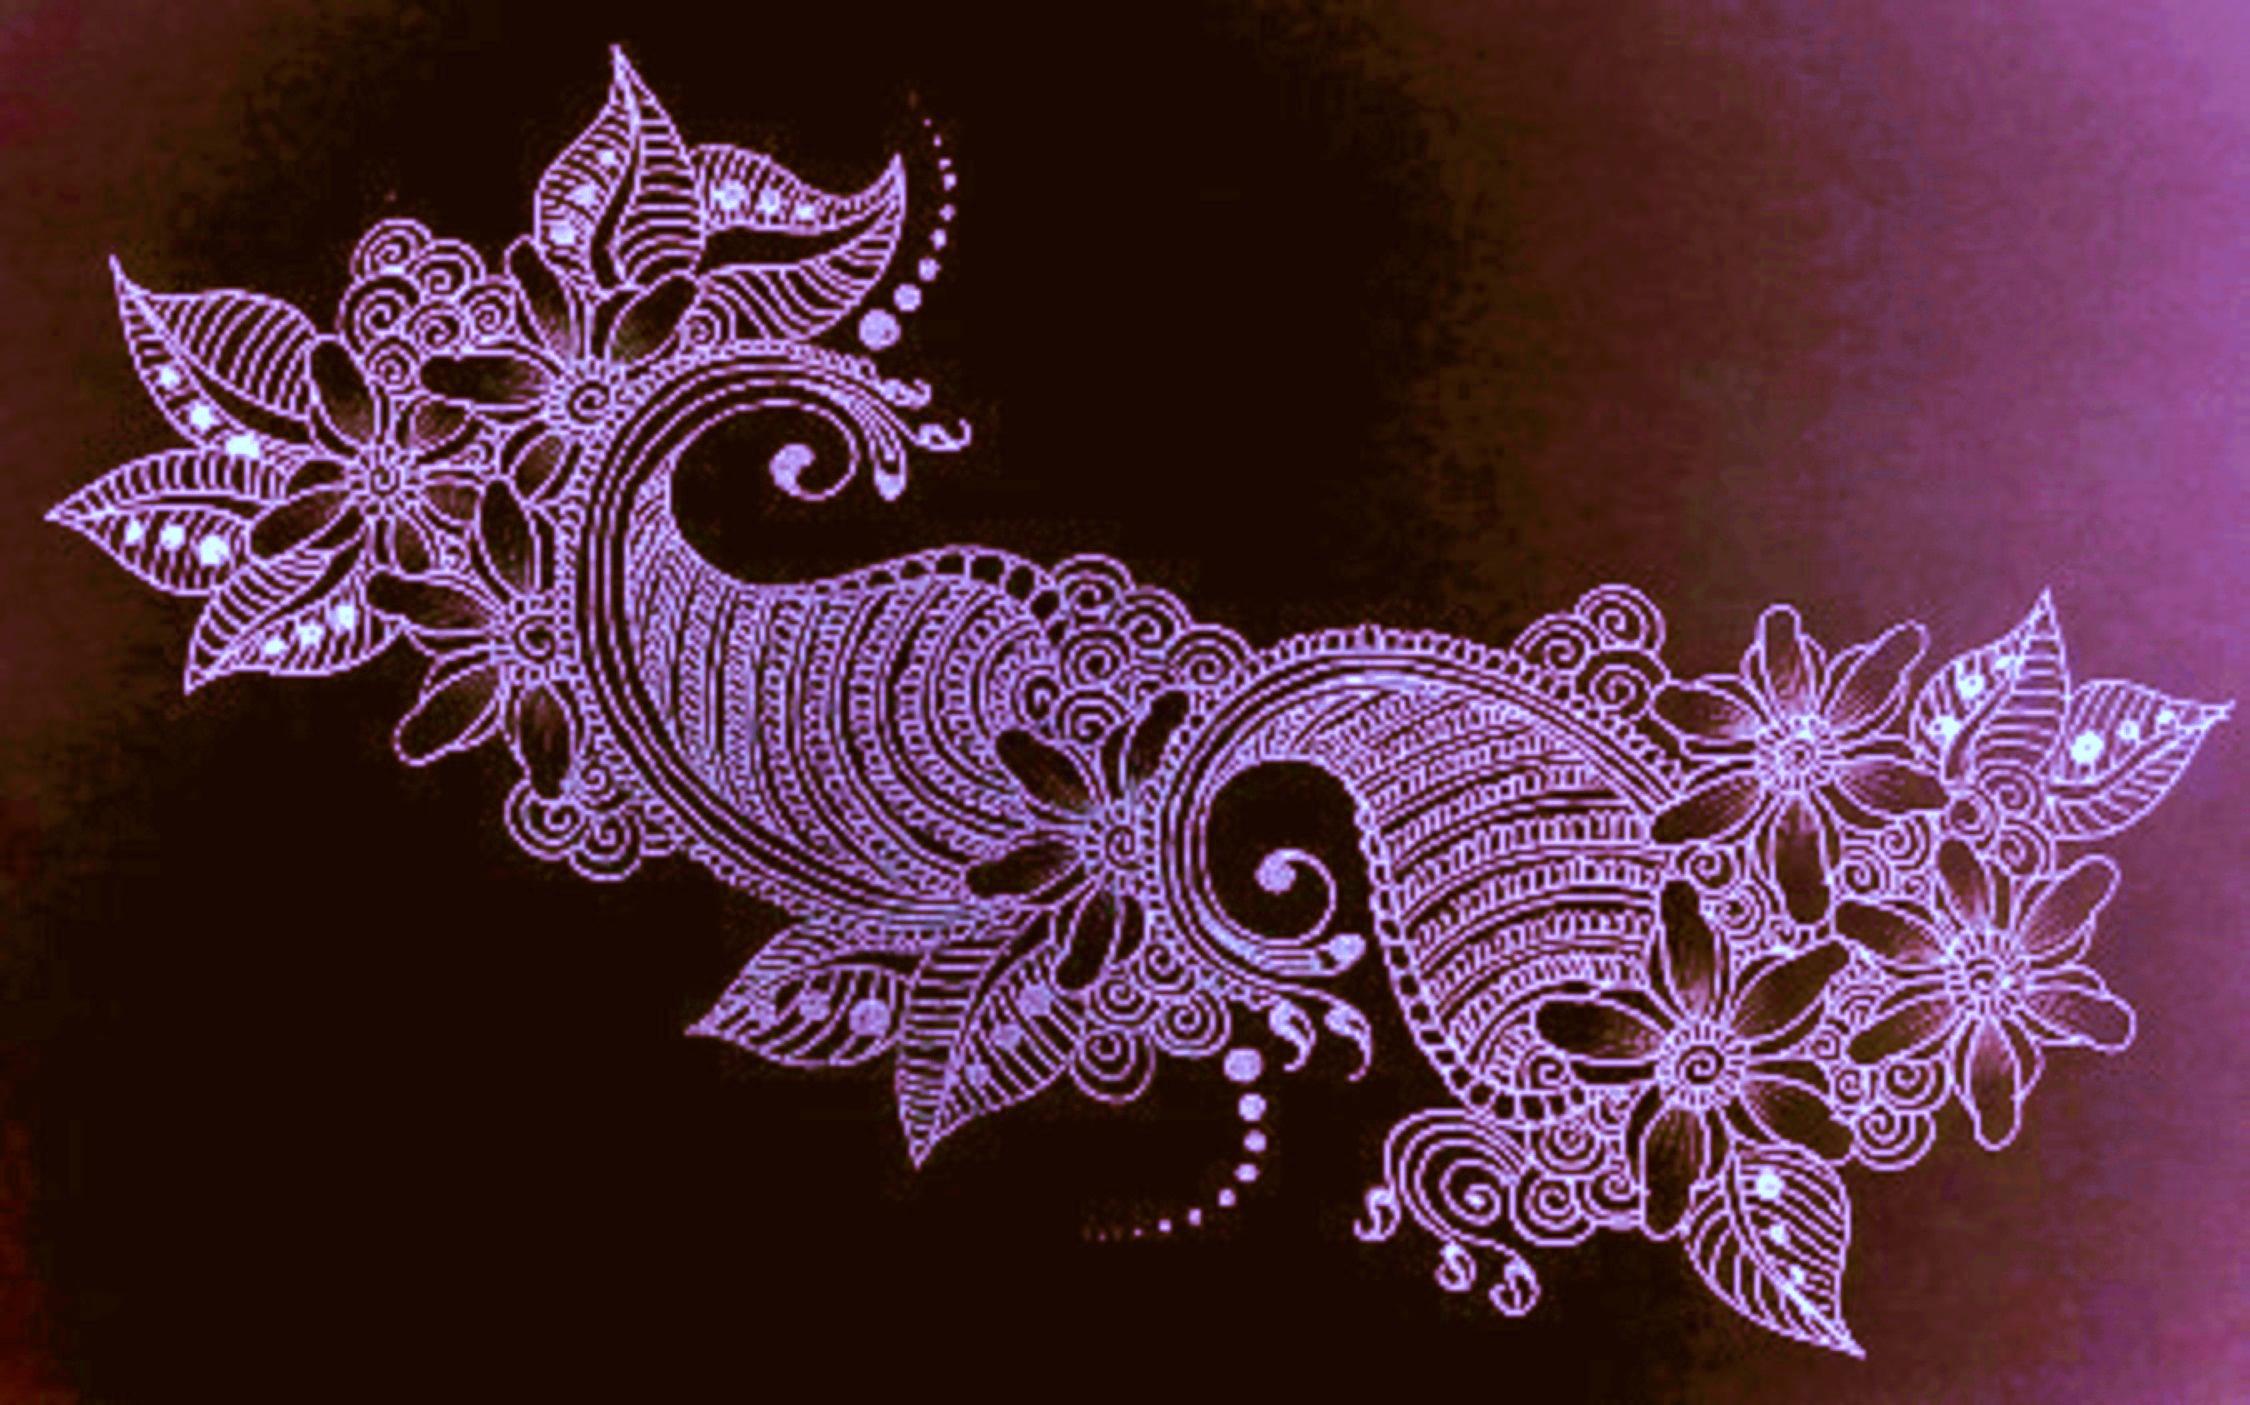 Drawn mehndi fast Drawing Mehndi Drawing